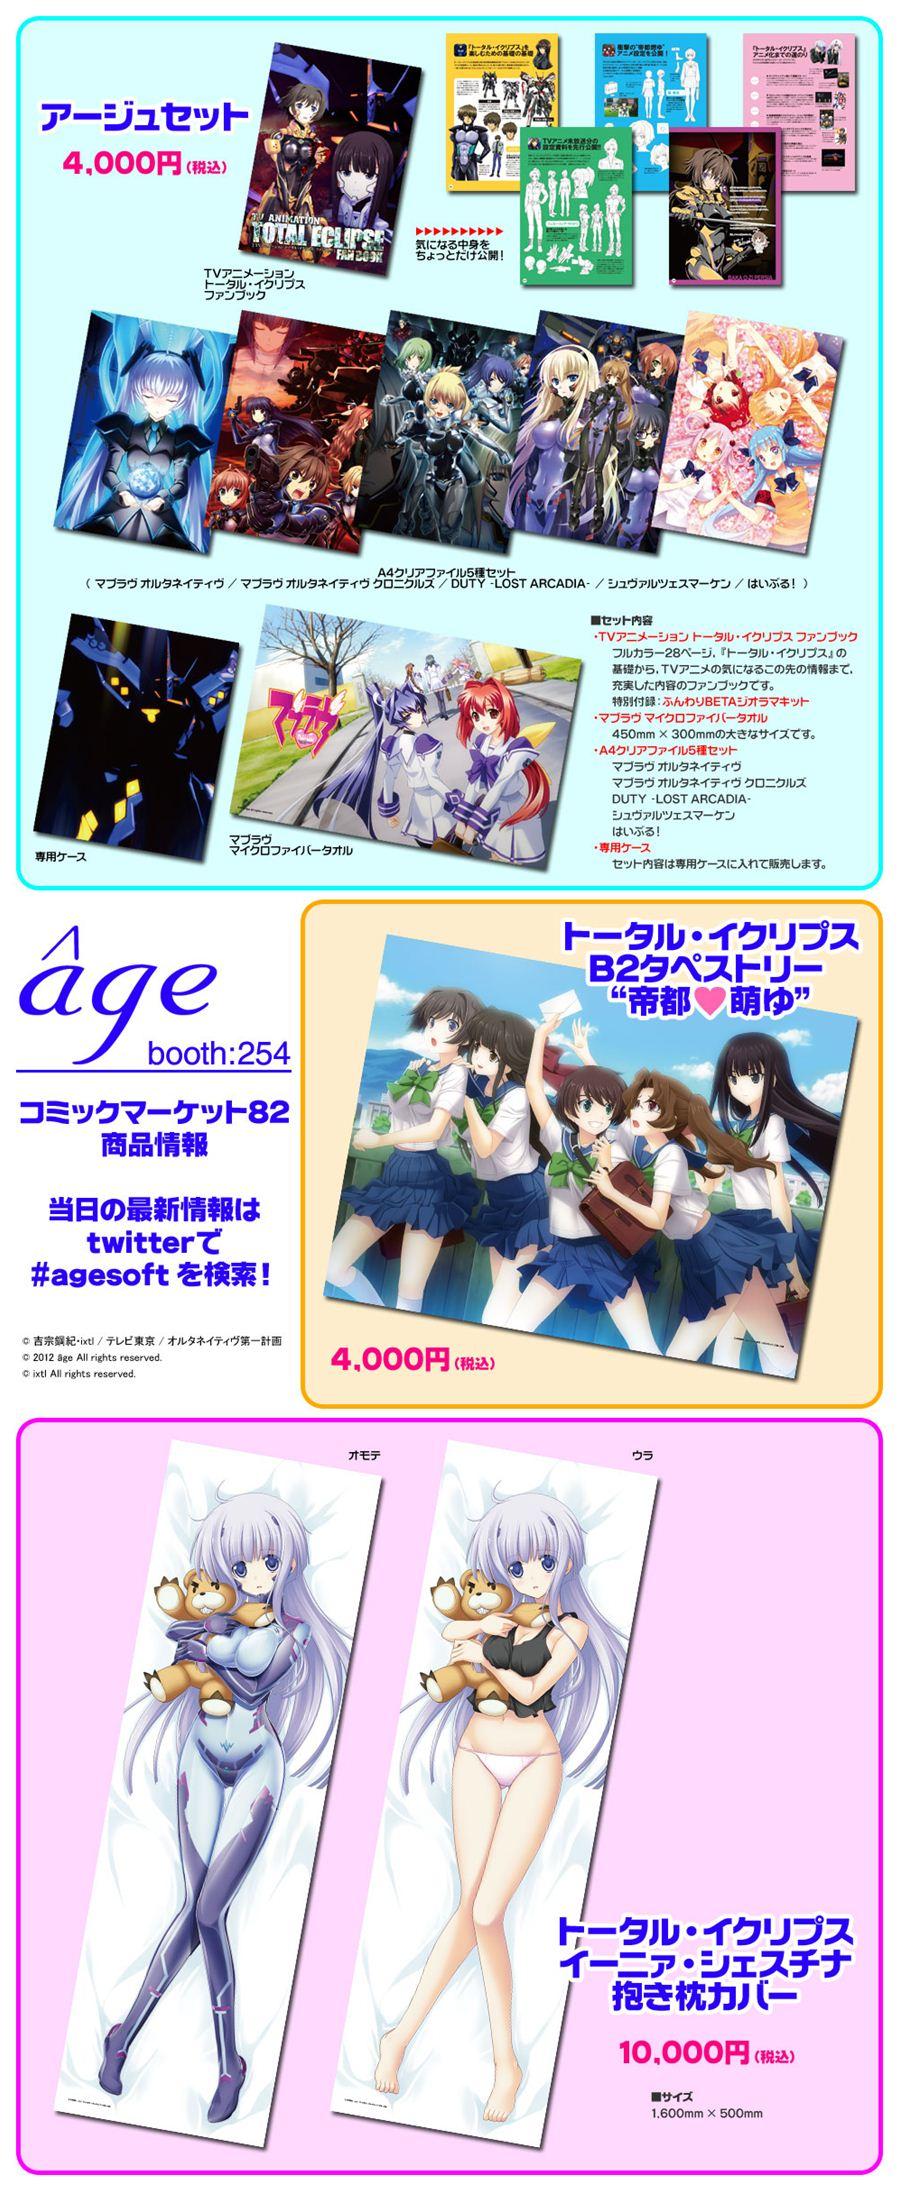 c82_254_age_syouhin_R.jpg